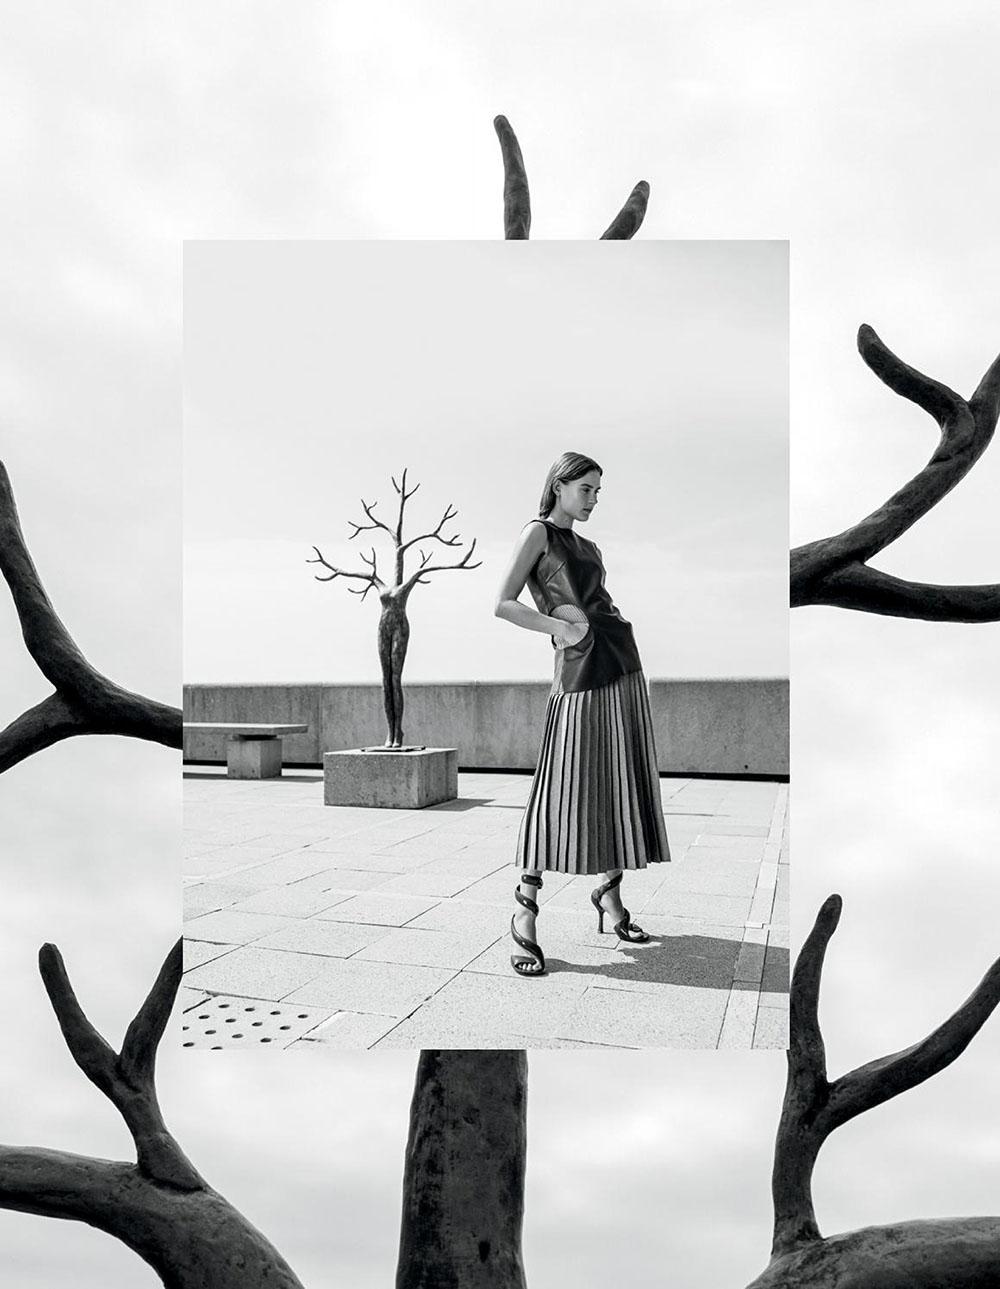 Vera van Erp by Anouk Hart for L'Officiel Mexico September 2020